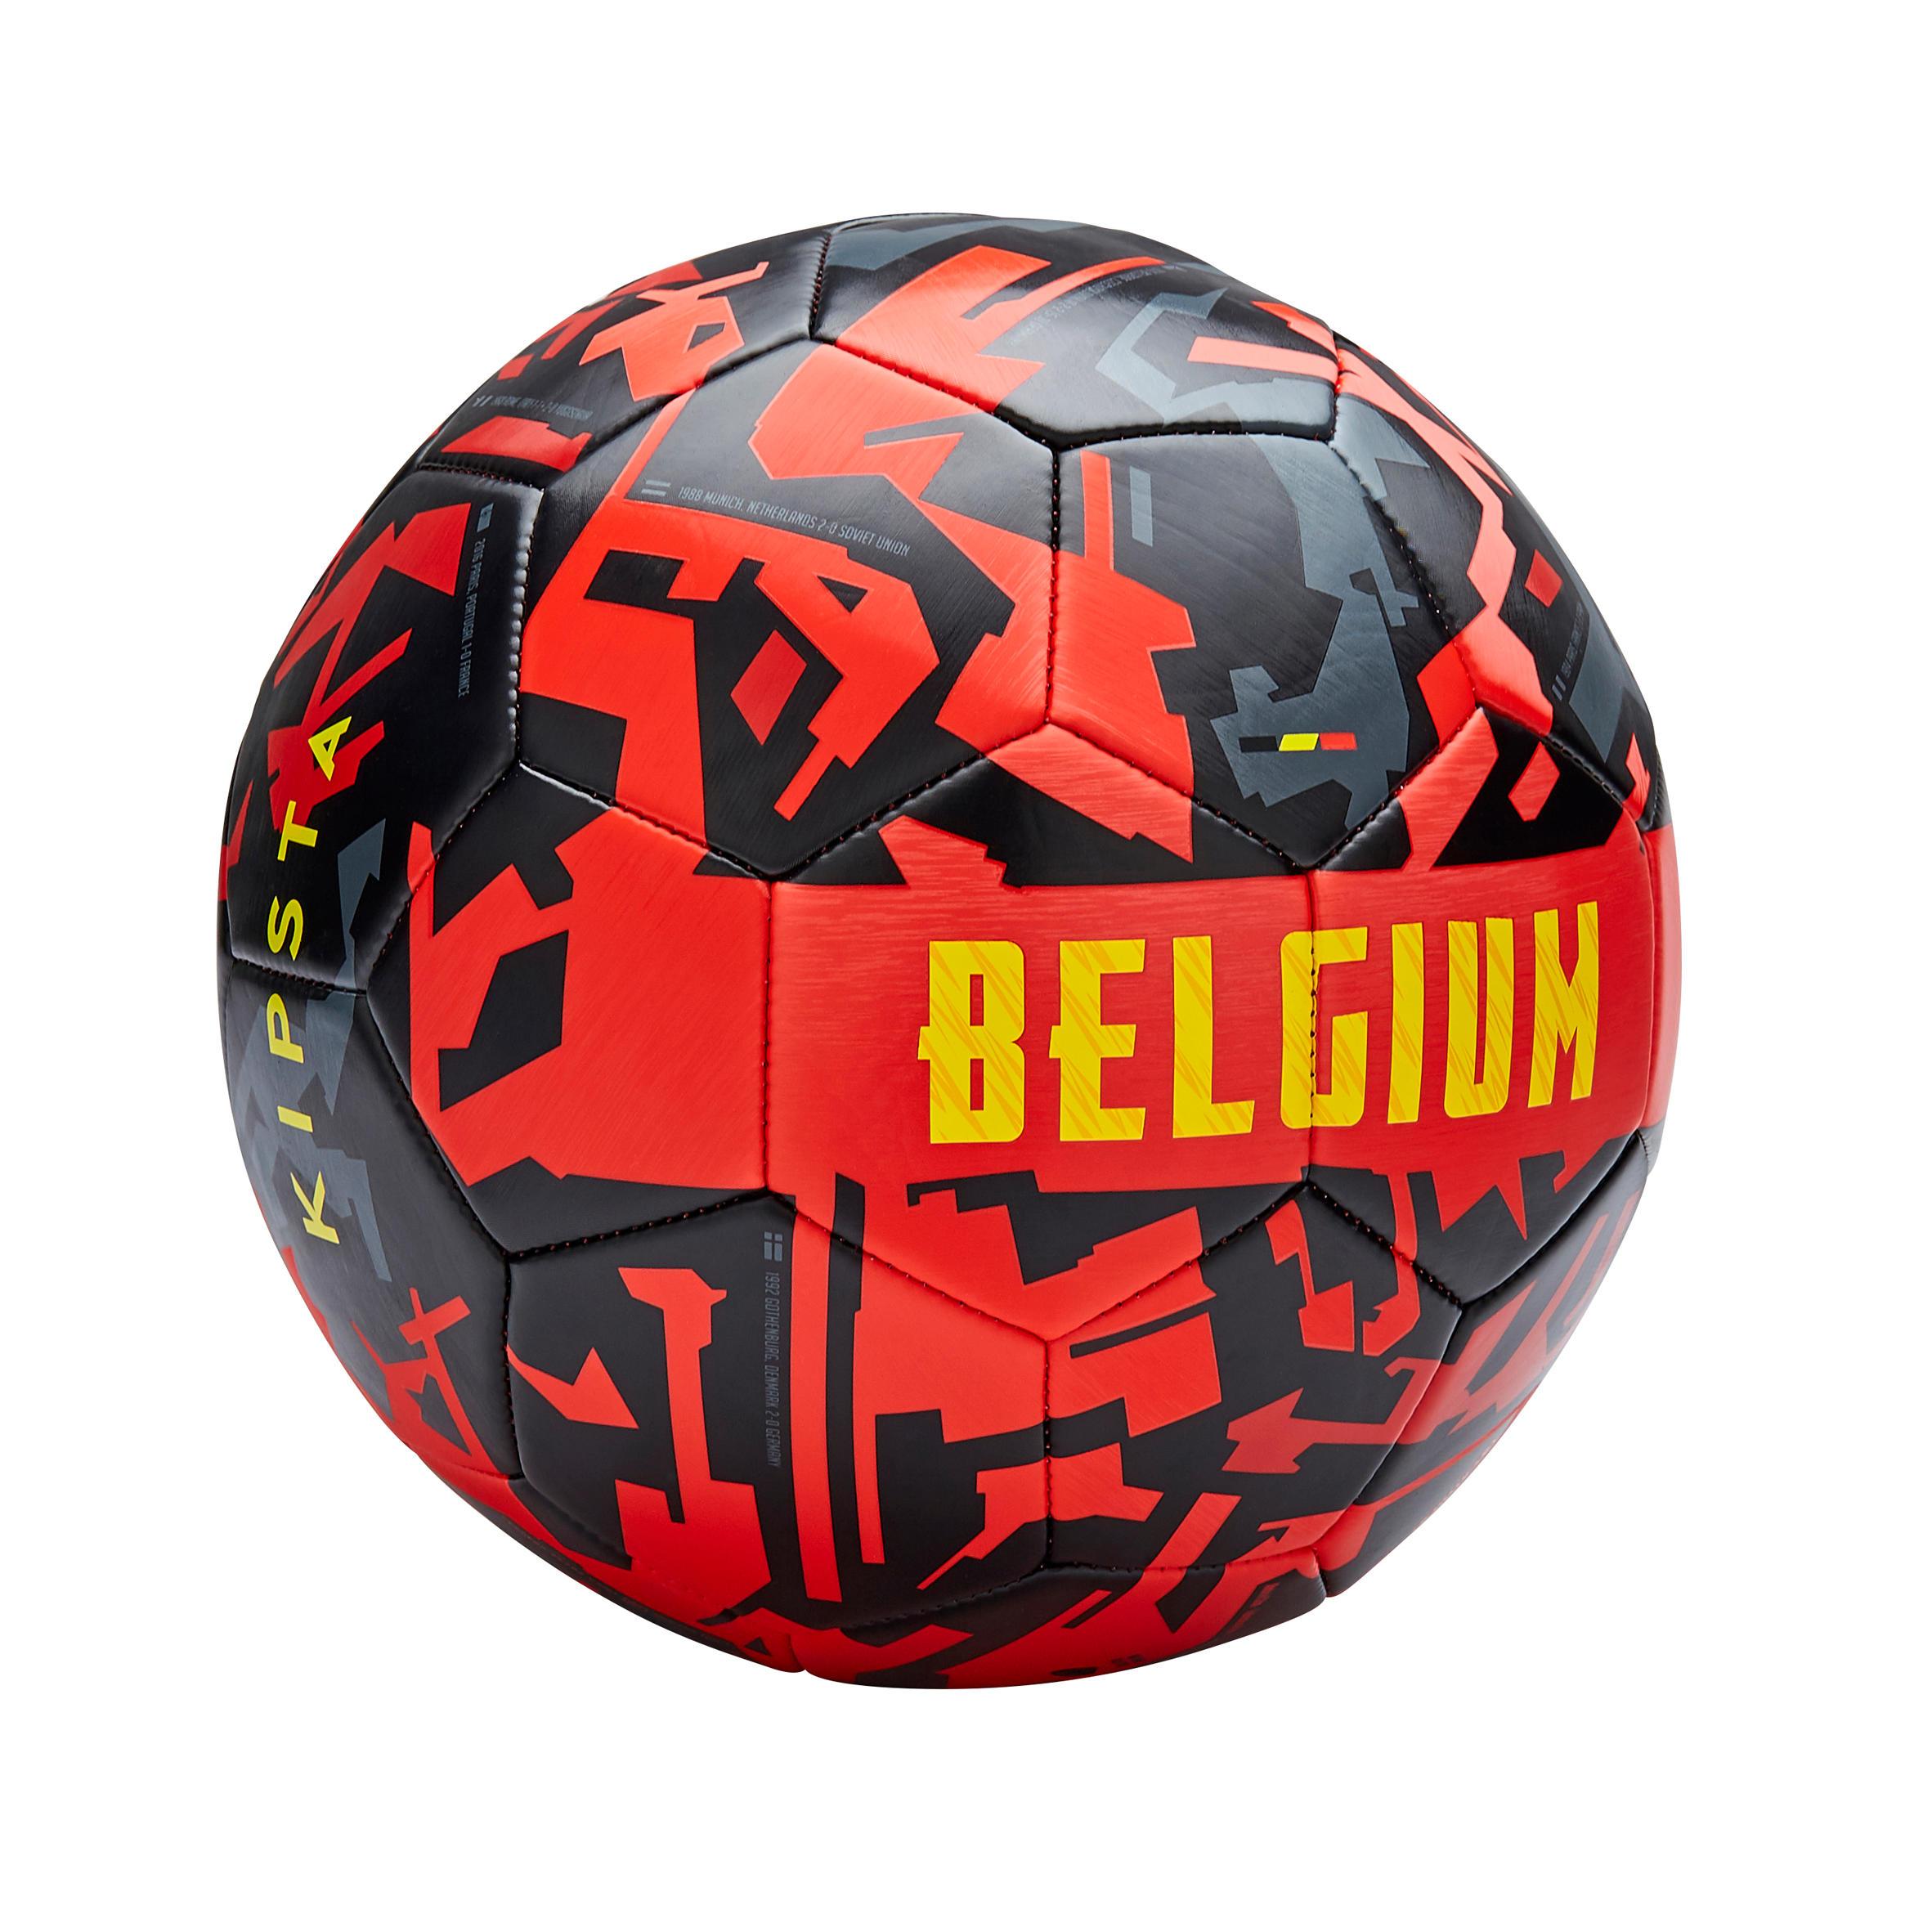 Minge Belgia 2020 M5 la Reducere poza